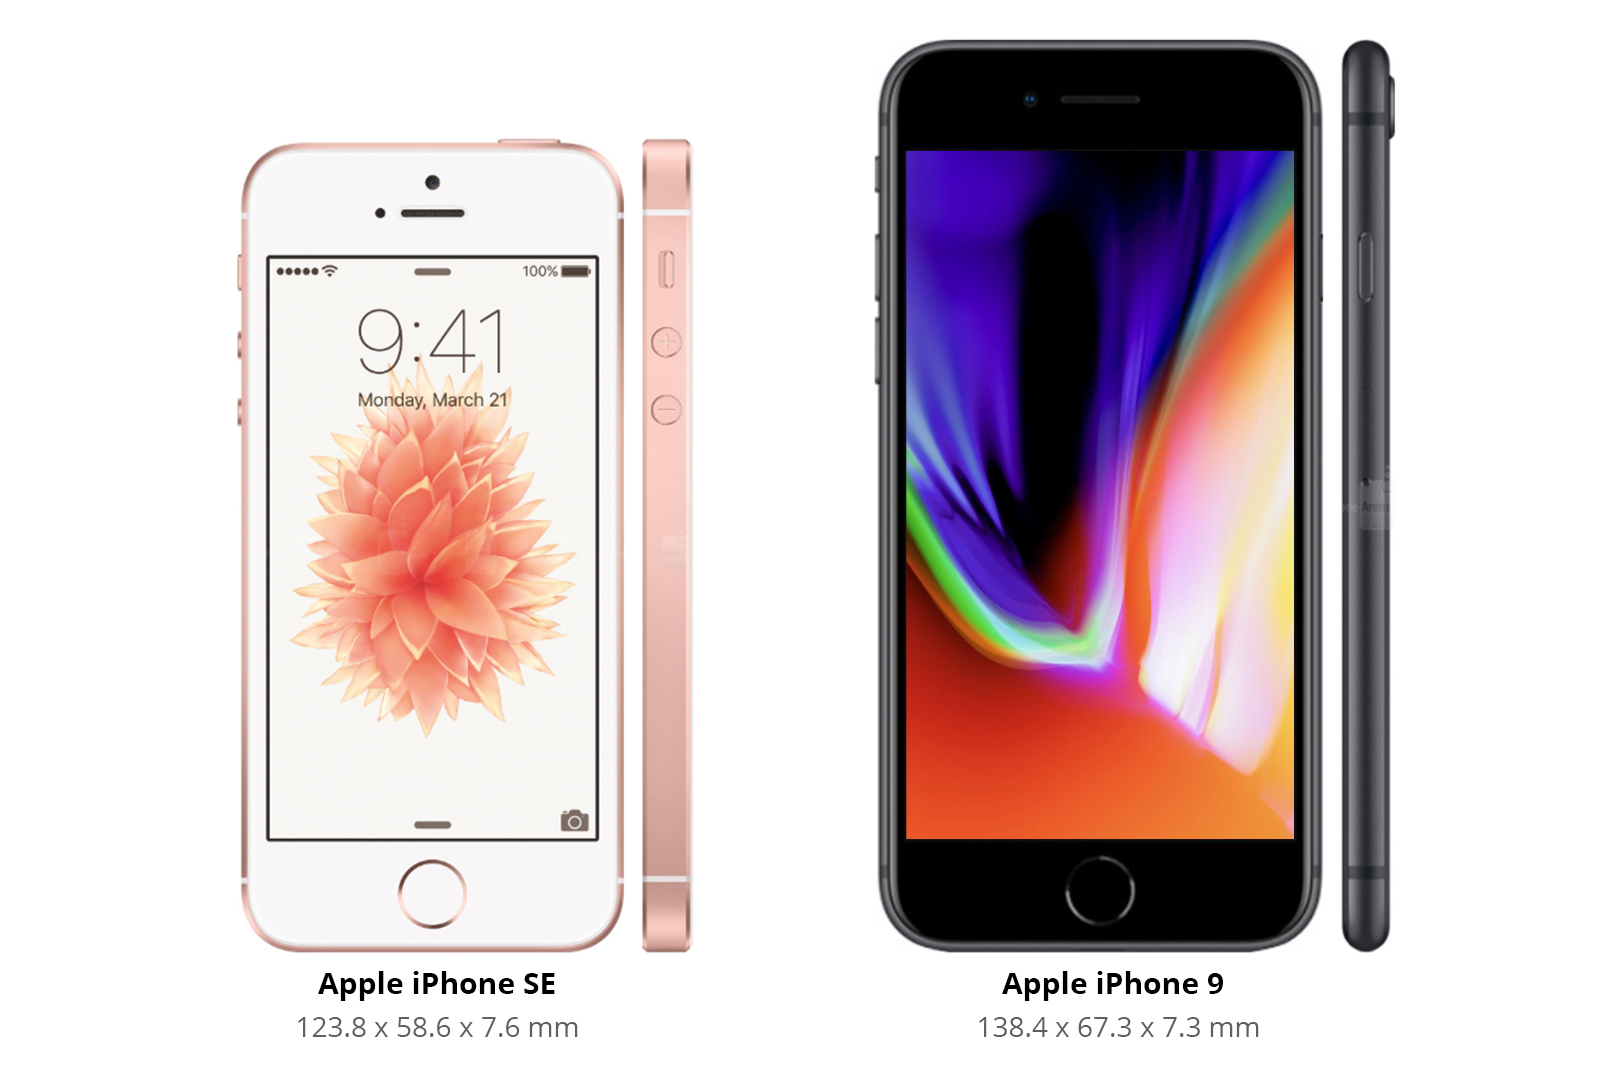 iPhone 9 & iPhone SE